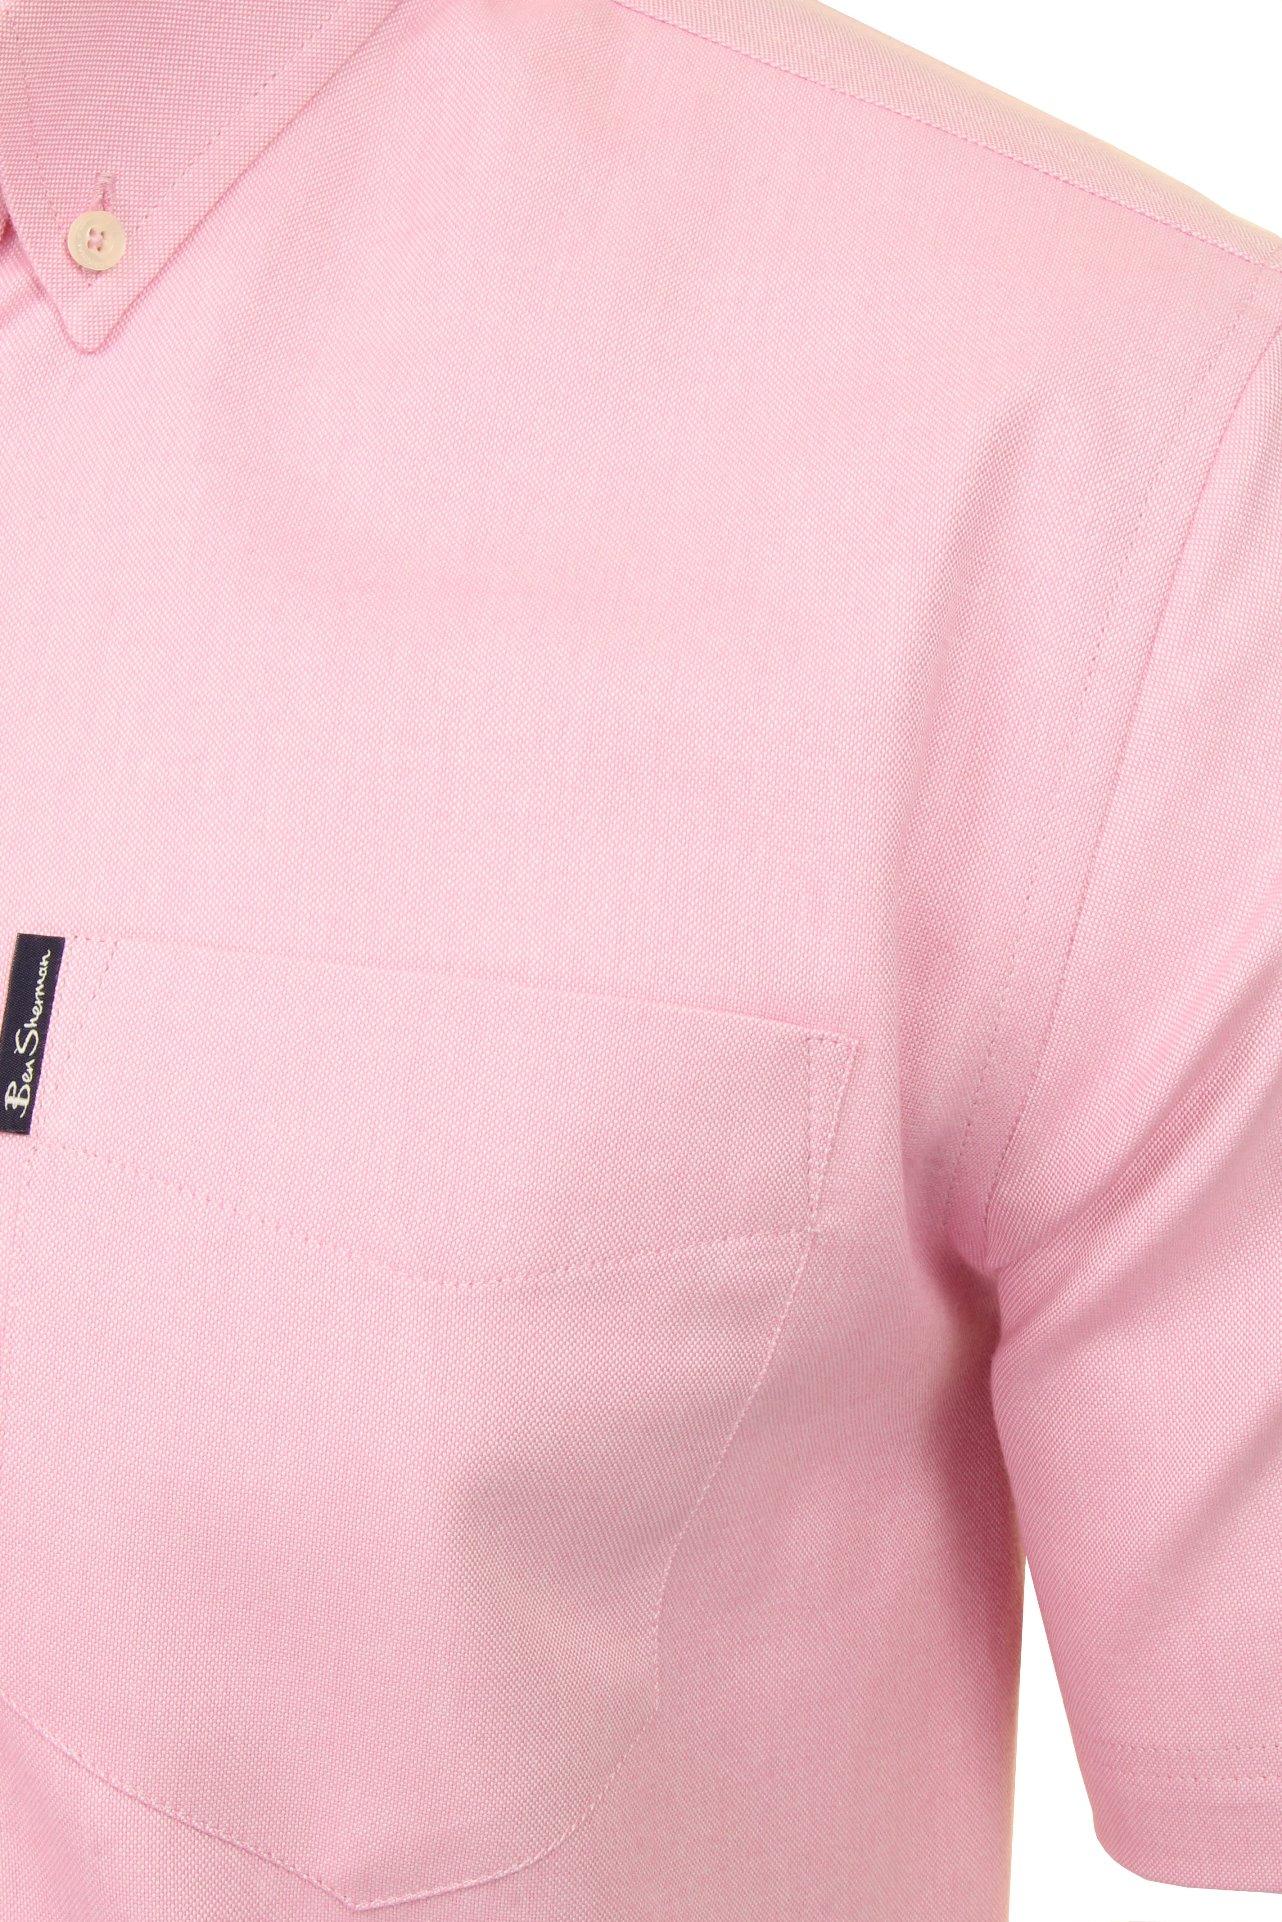 Ben-Sherman-Mens-Oxford-Shirt-Short-Sleeve thumbnail 31